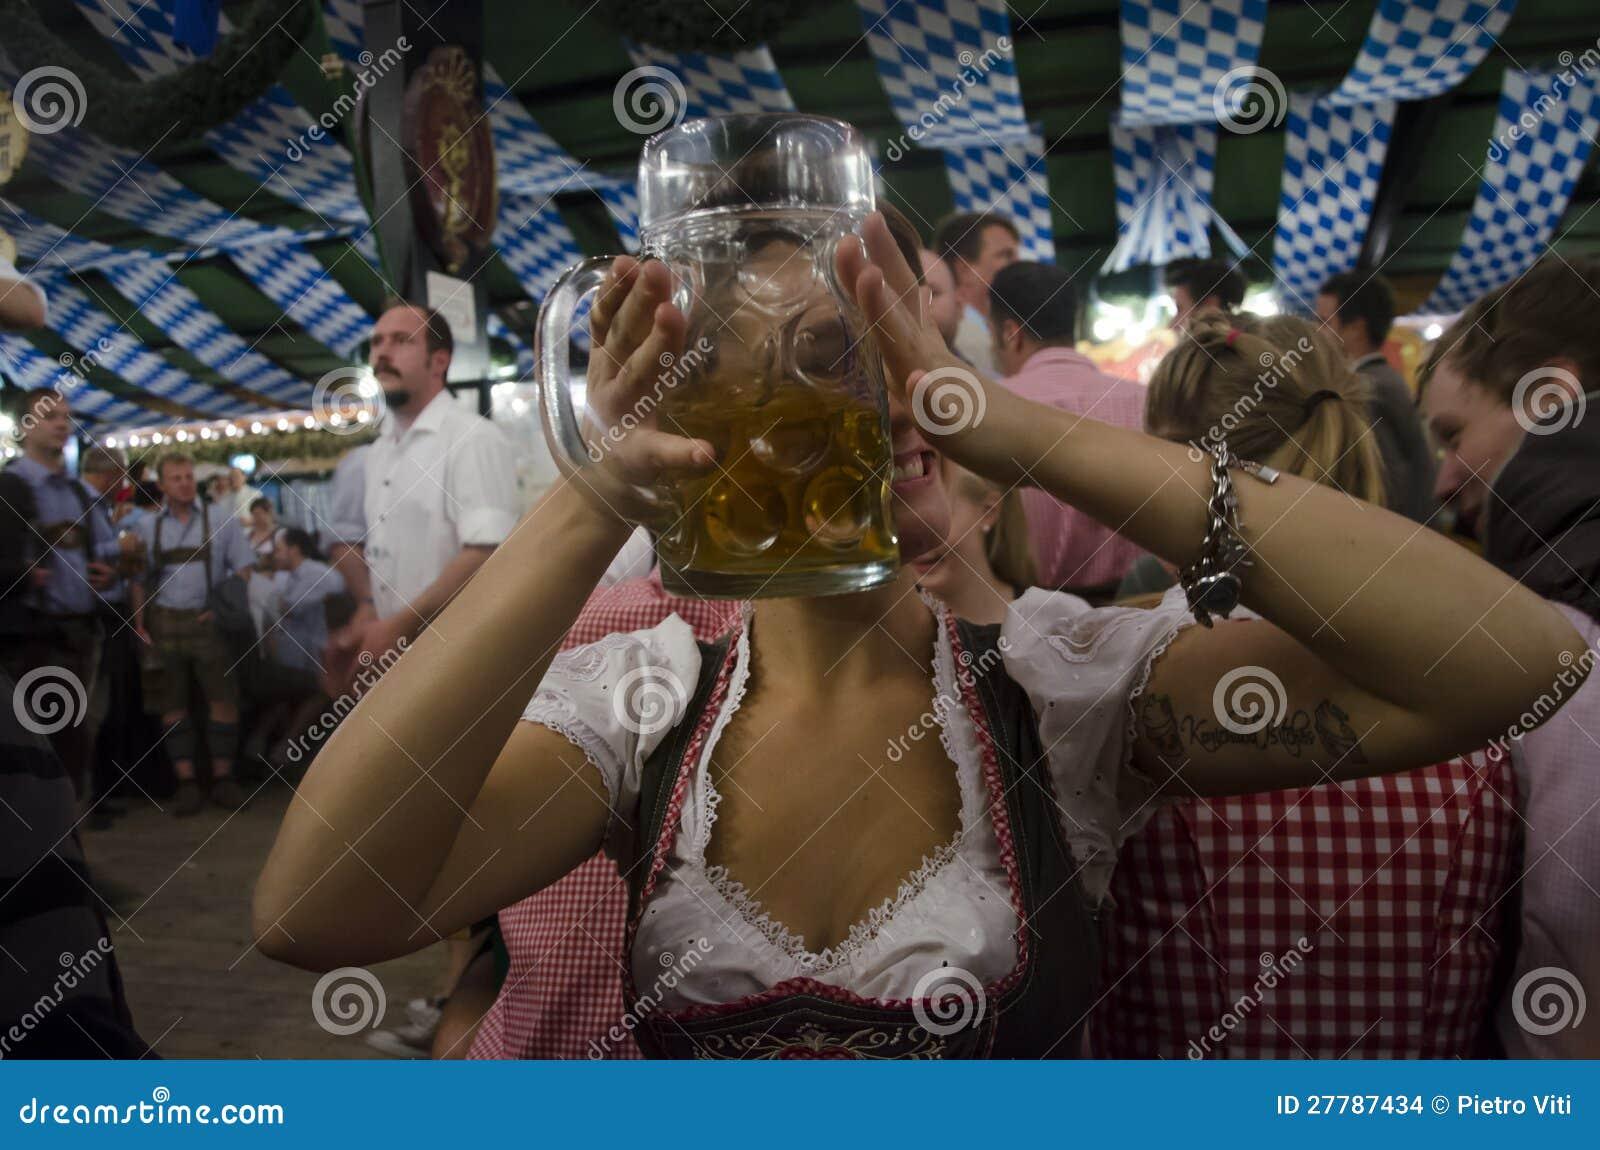 German girl drinking during Oktoberfest 2012